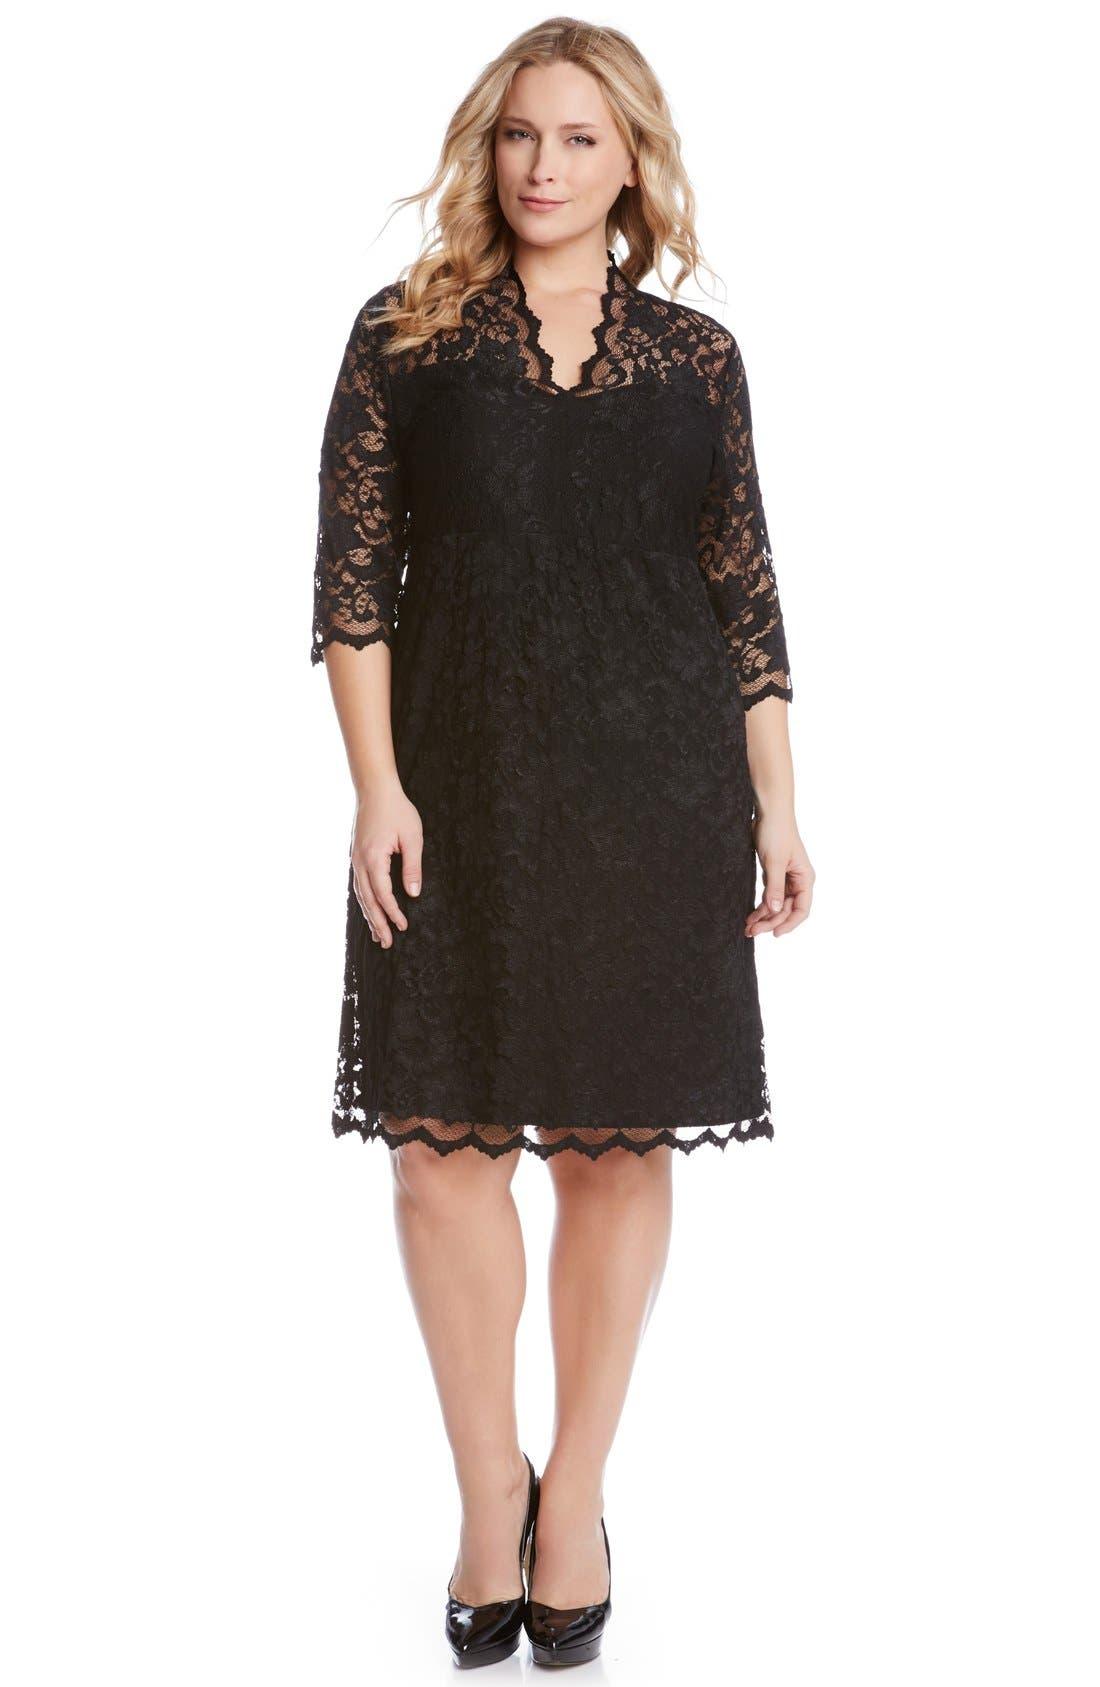 Scalloped Stretch Lace Dress,                             Alternate thumbnail 3, color,                             Black